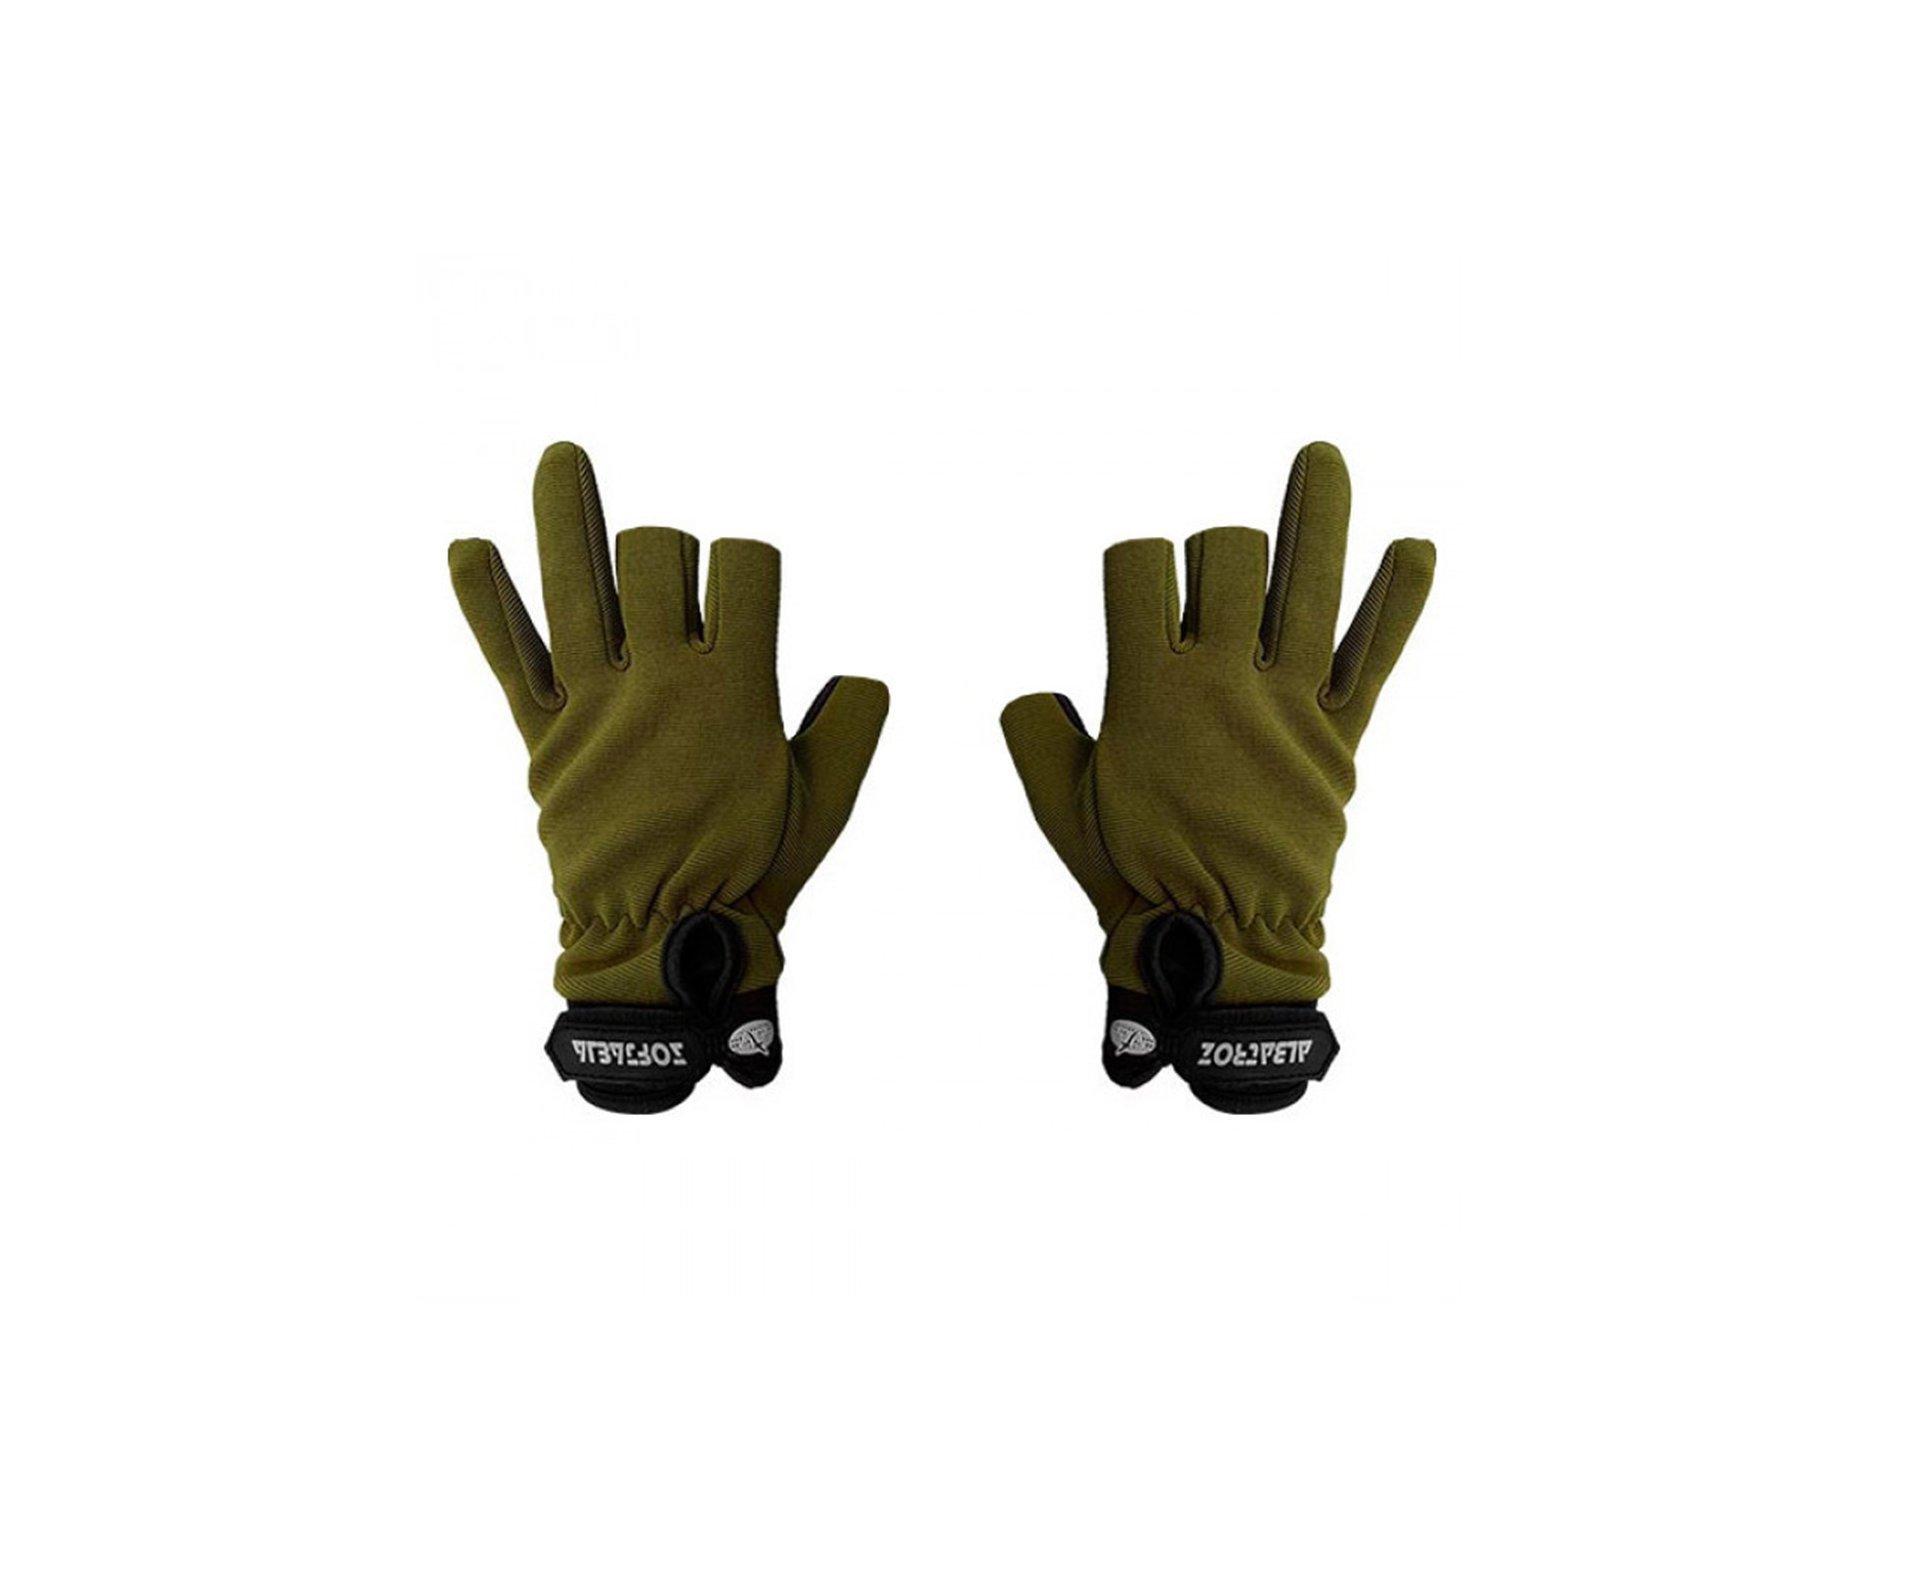 Luva Tatica Sniper Sensitive Verde - Albatroz - GG